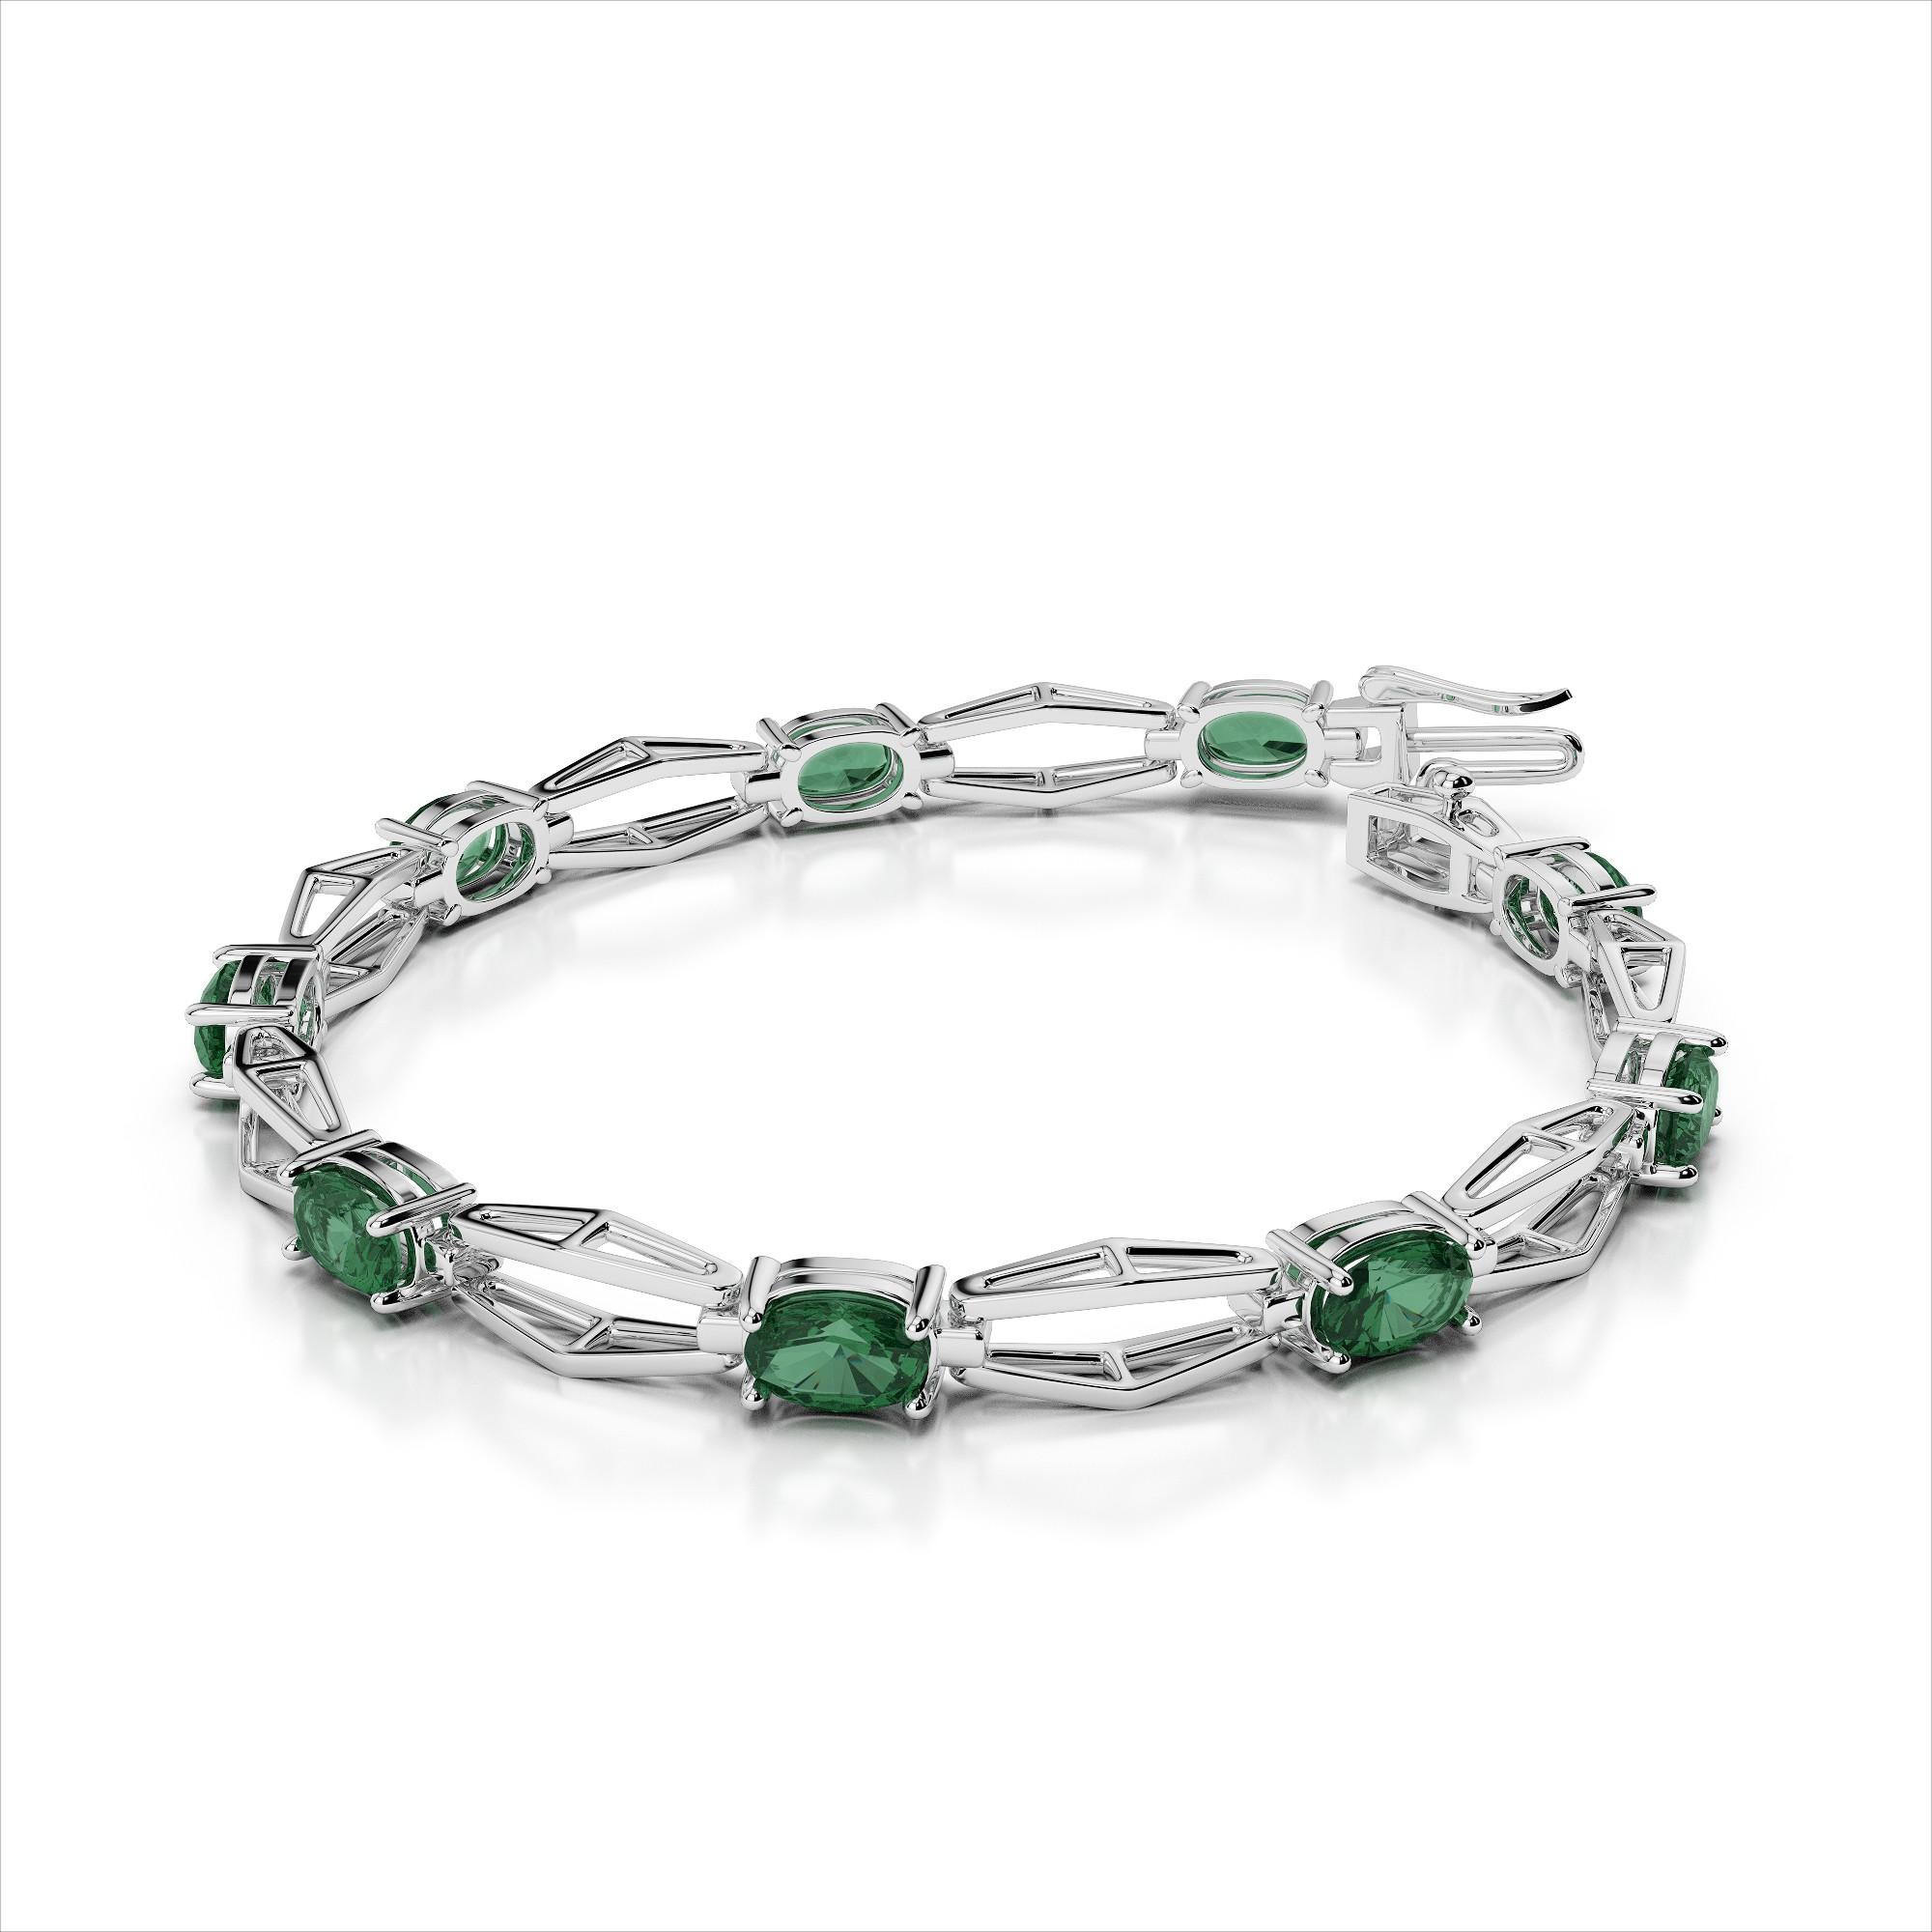 Hexagon Link 5x3mm Gemstone Bracelet